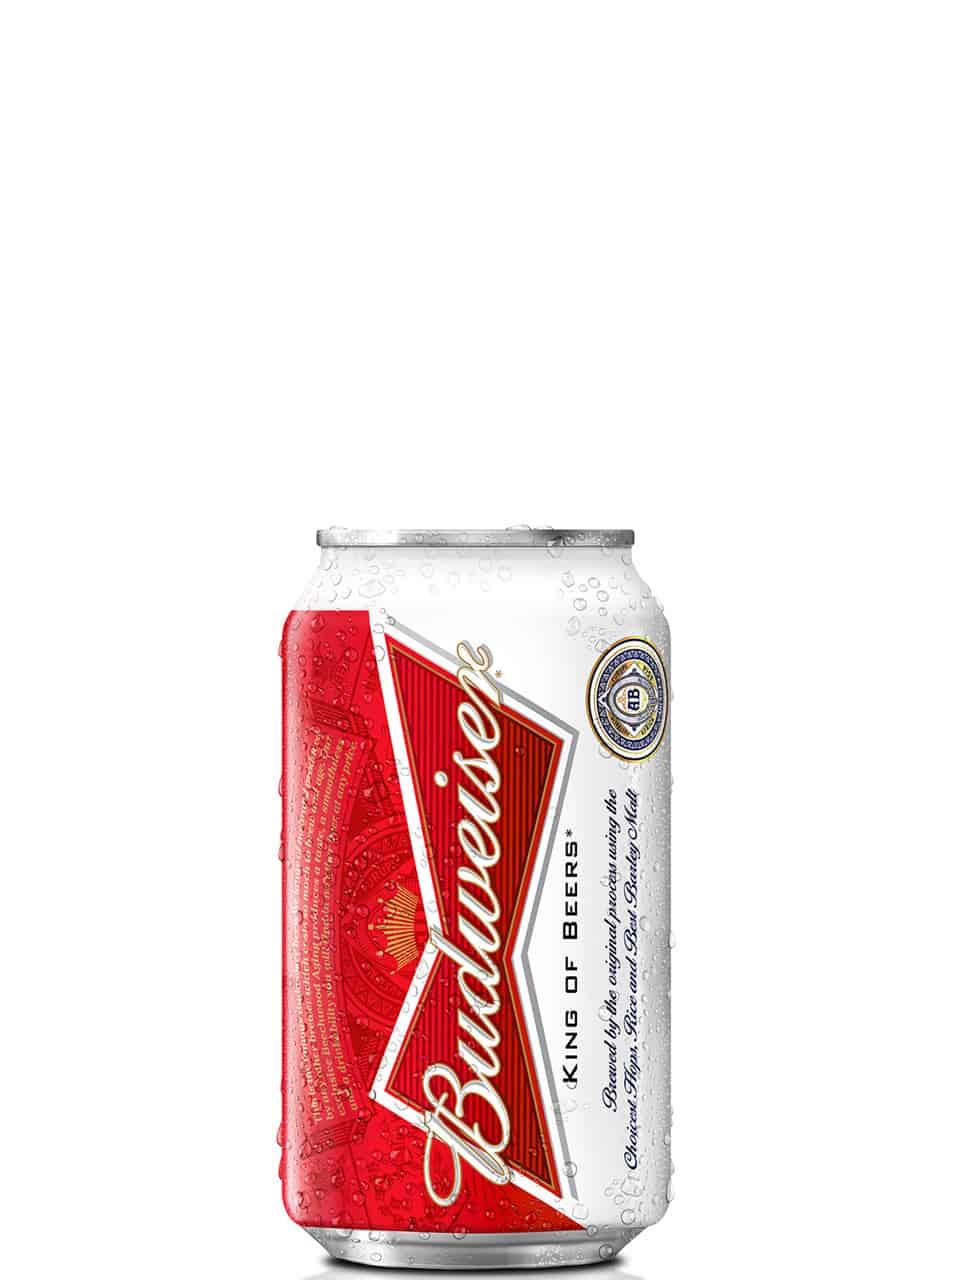 Budweiser 15 Pack Cans